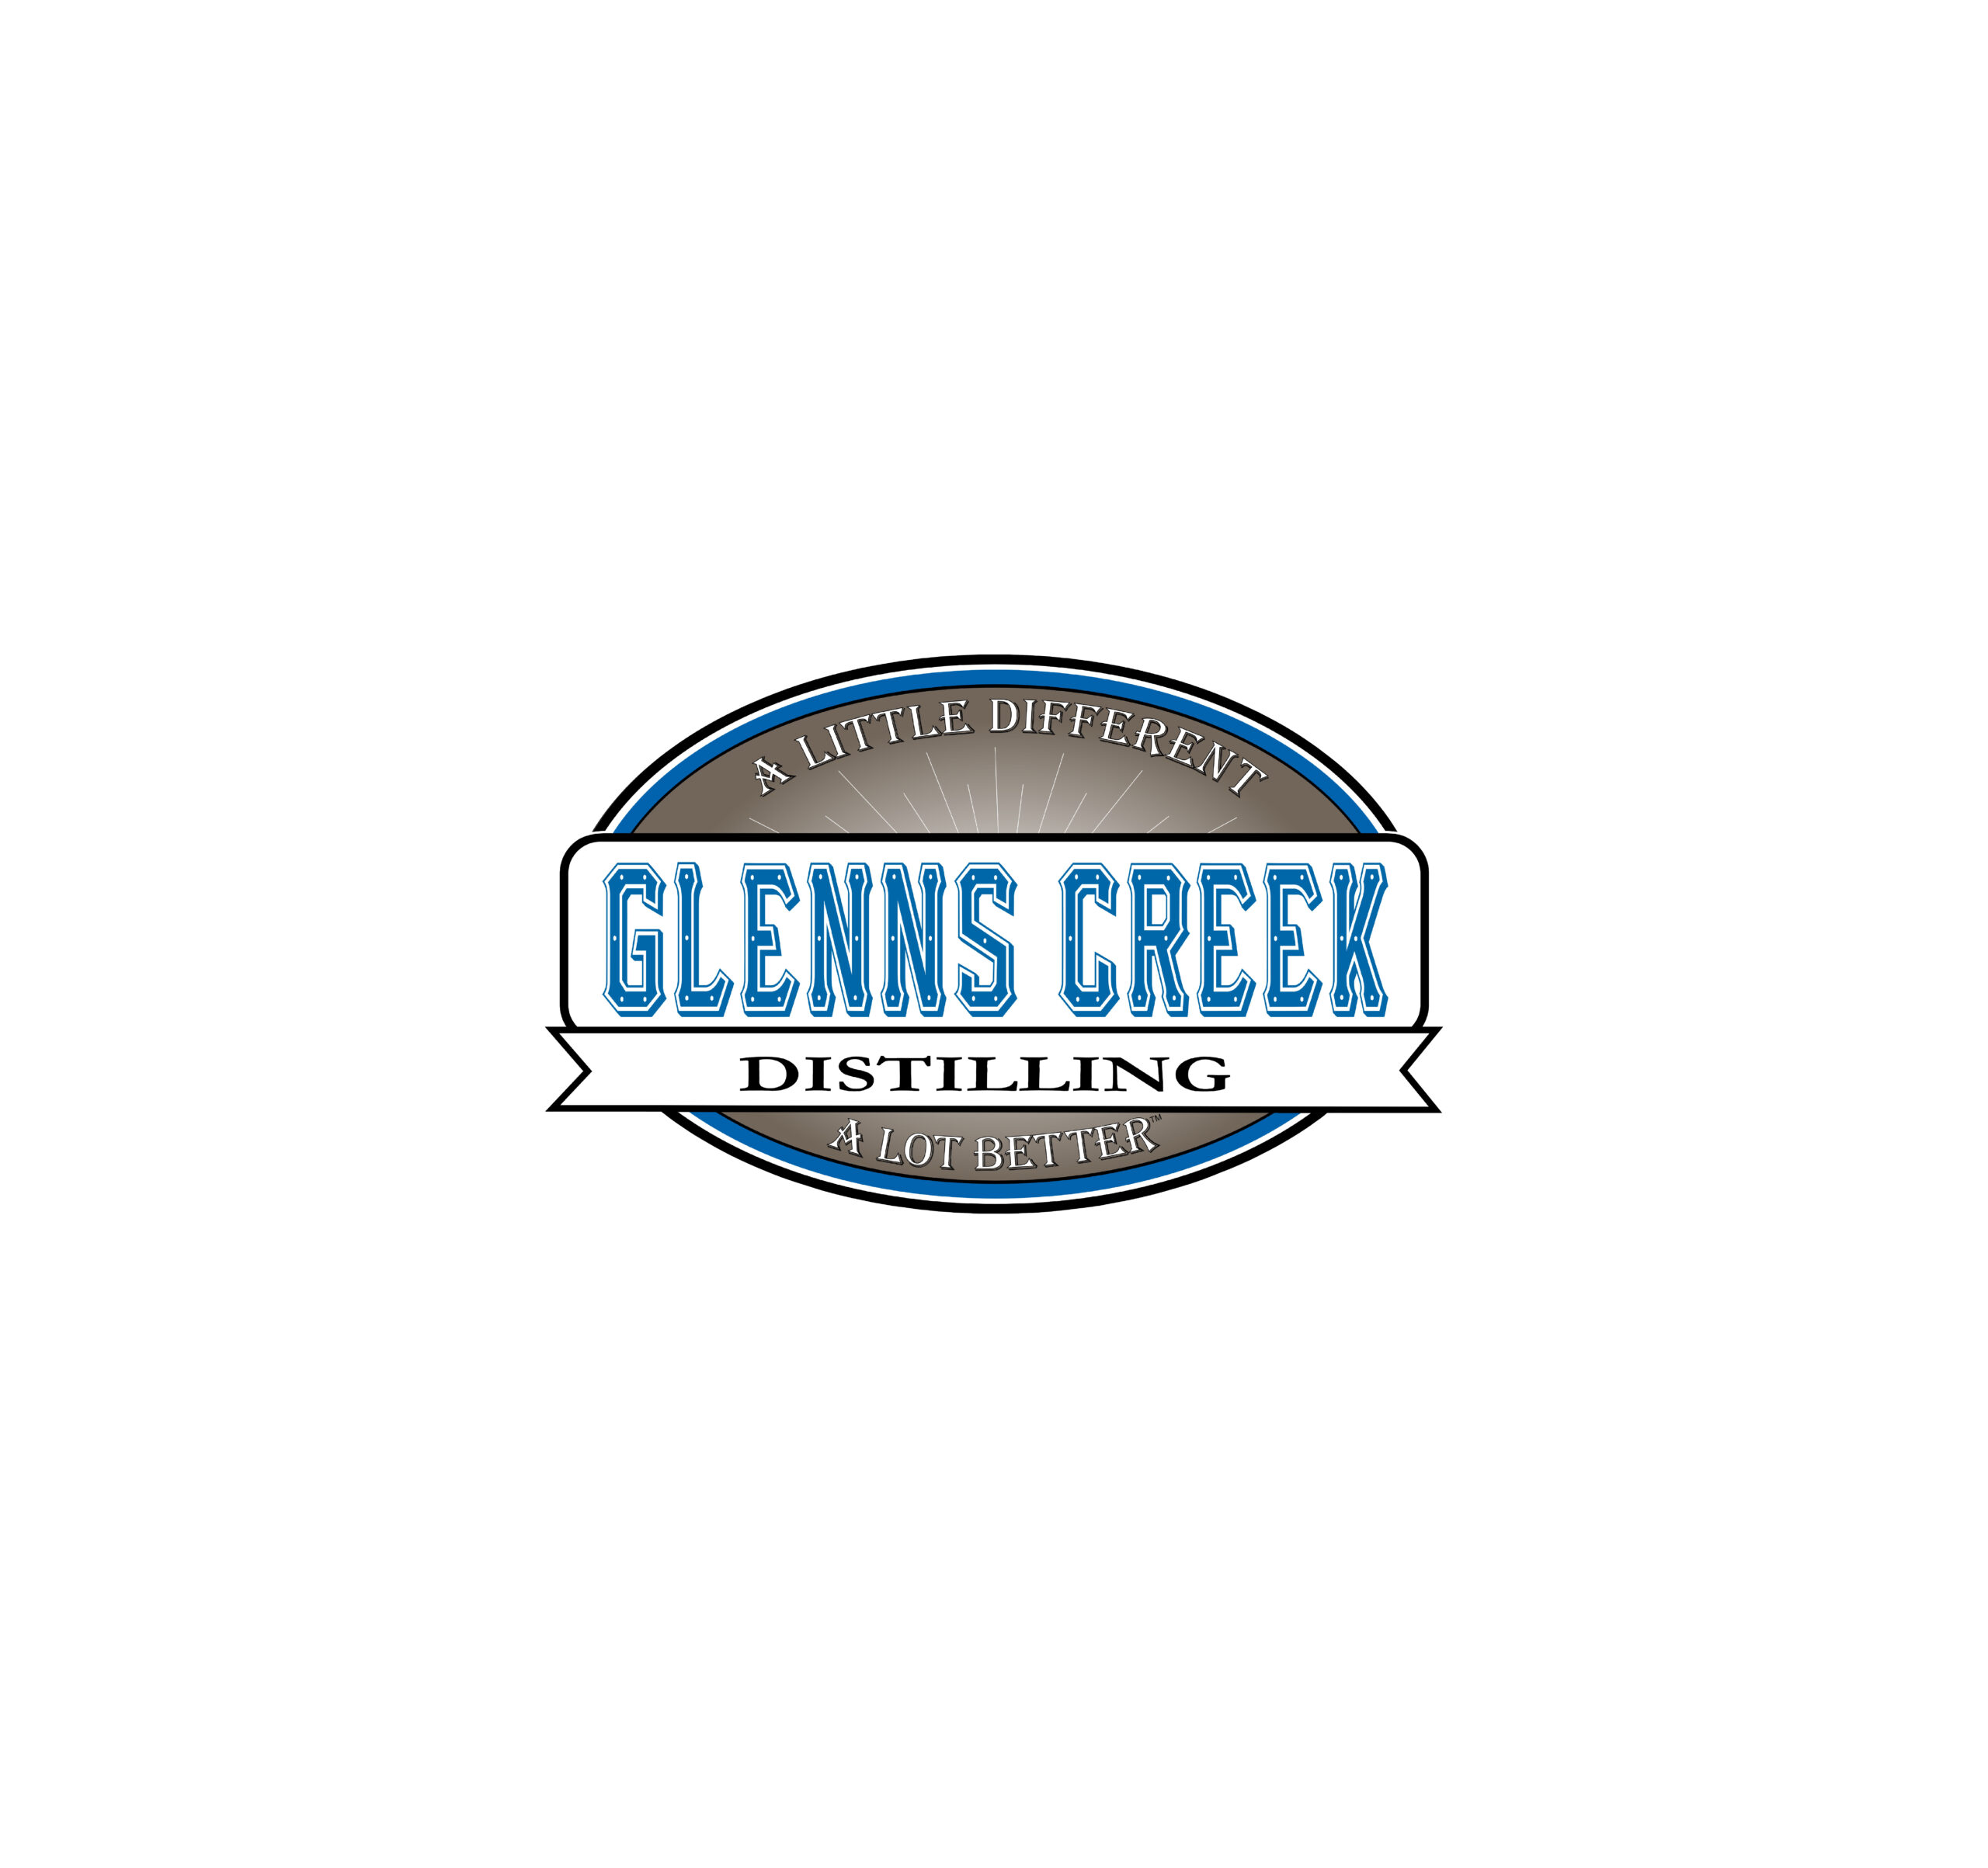 Glenns Creek Distillery